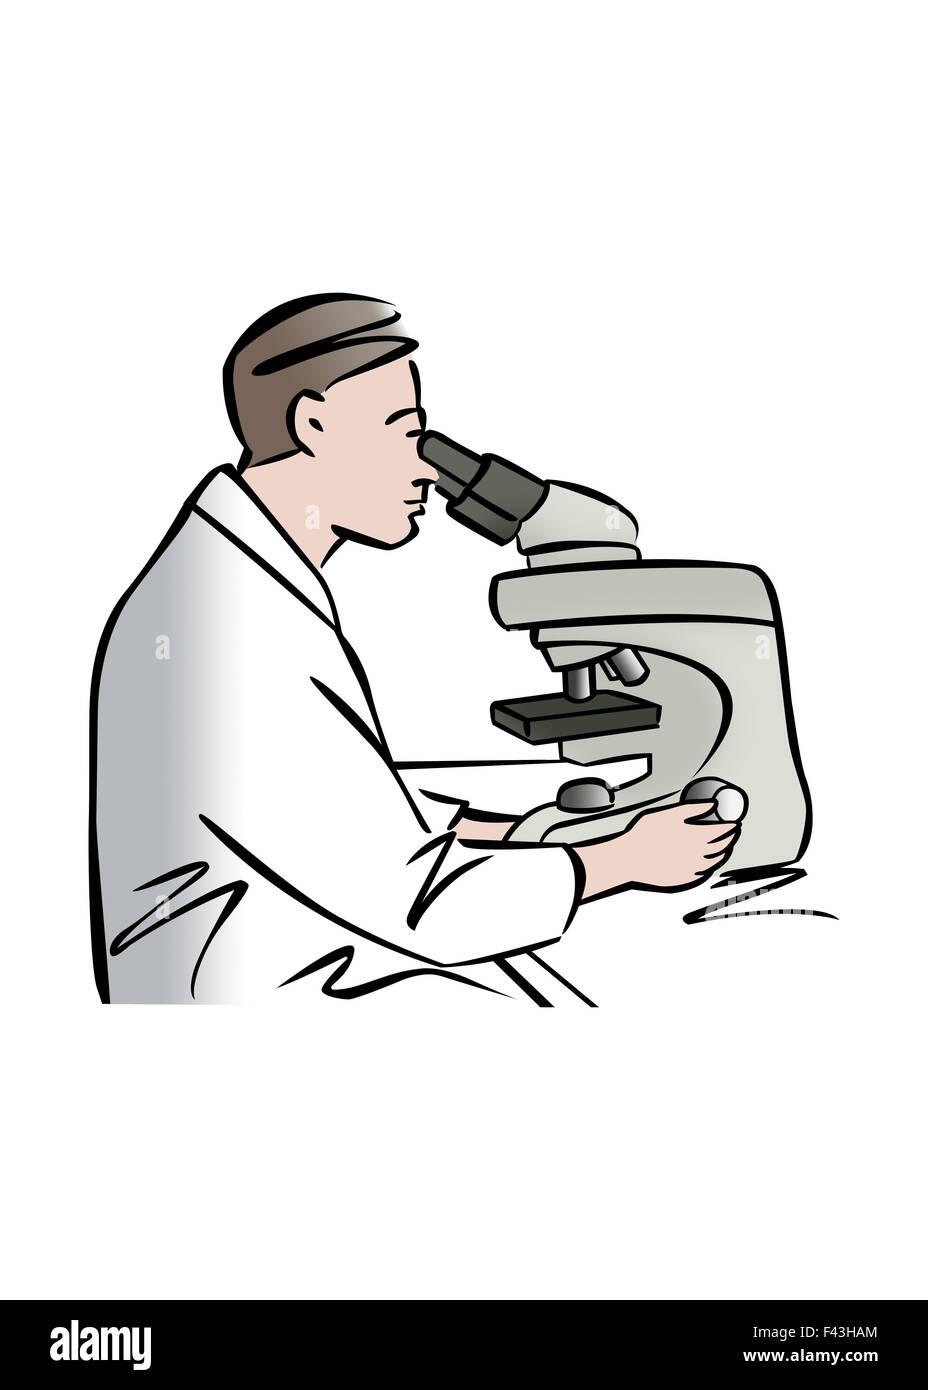 Illustration of male scientist using microscope - Stock Image